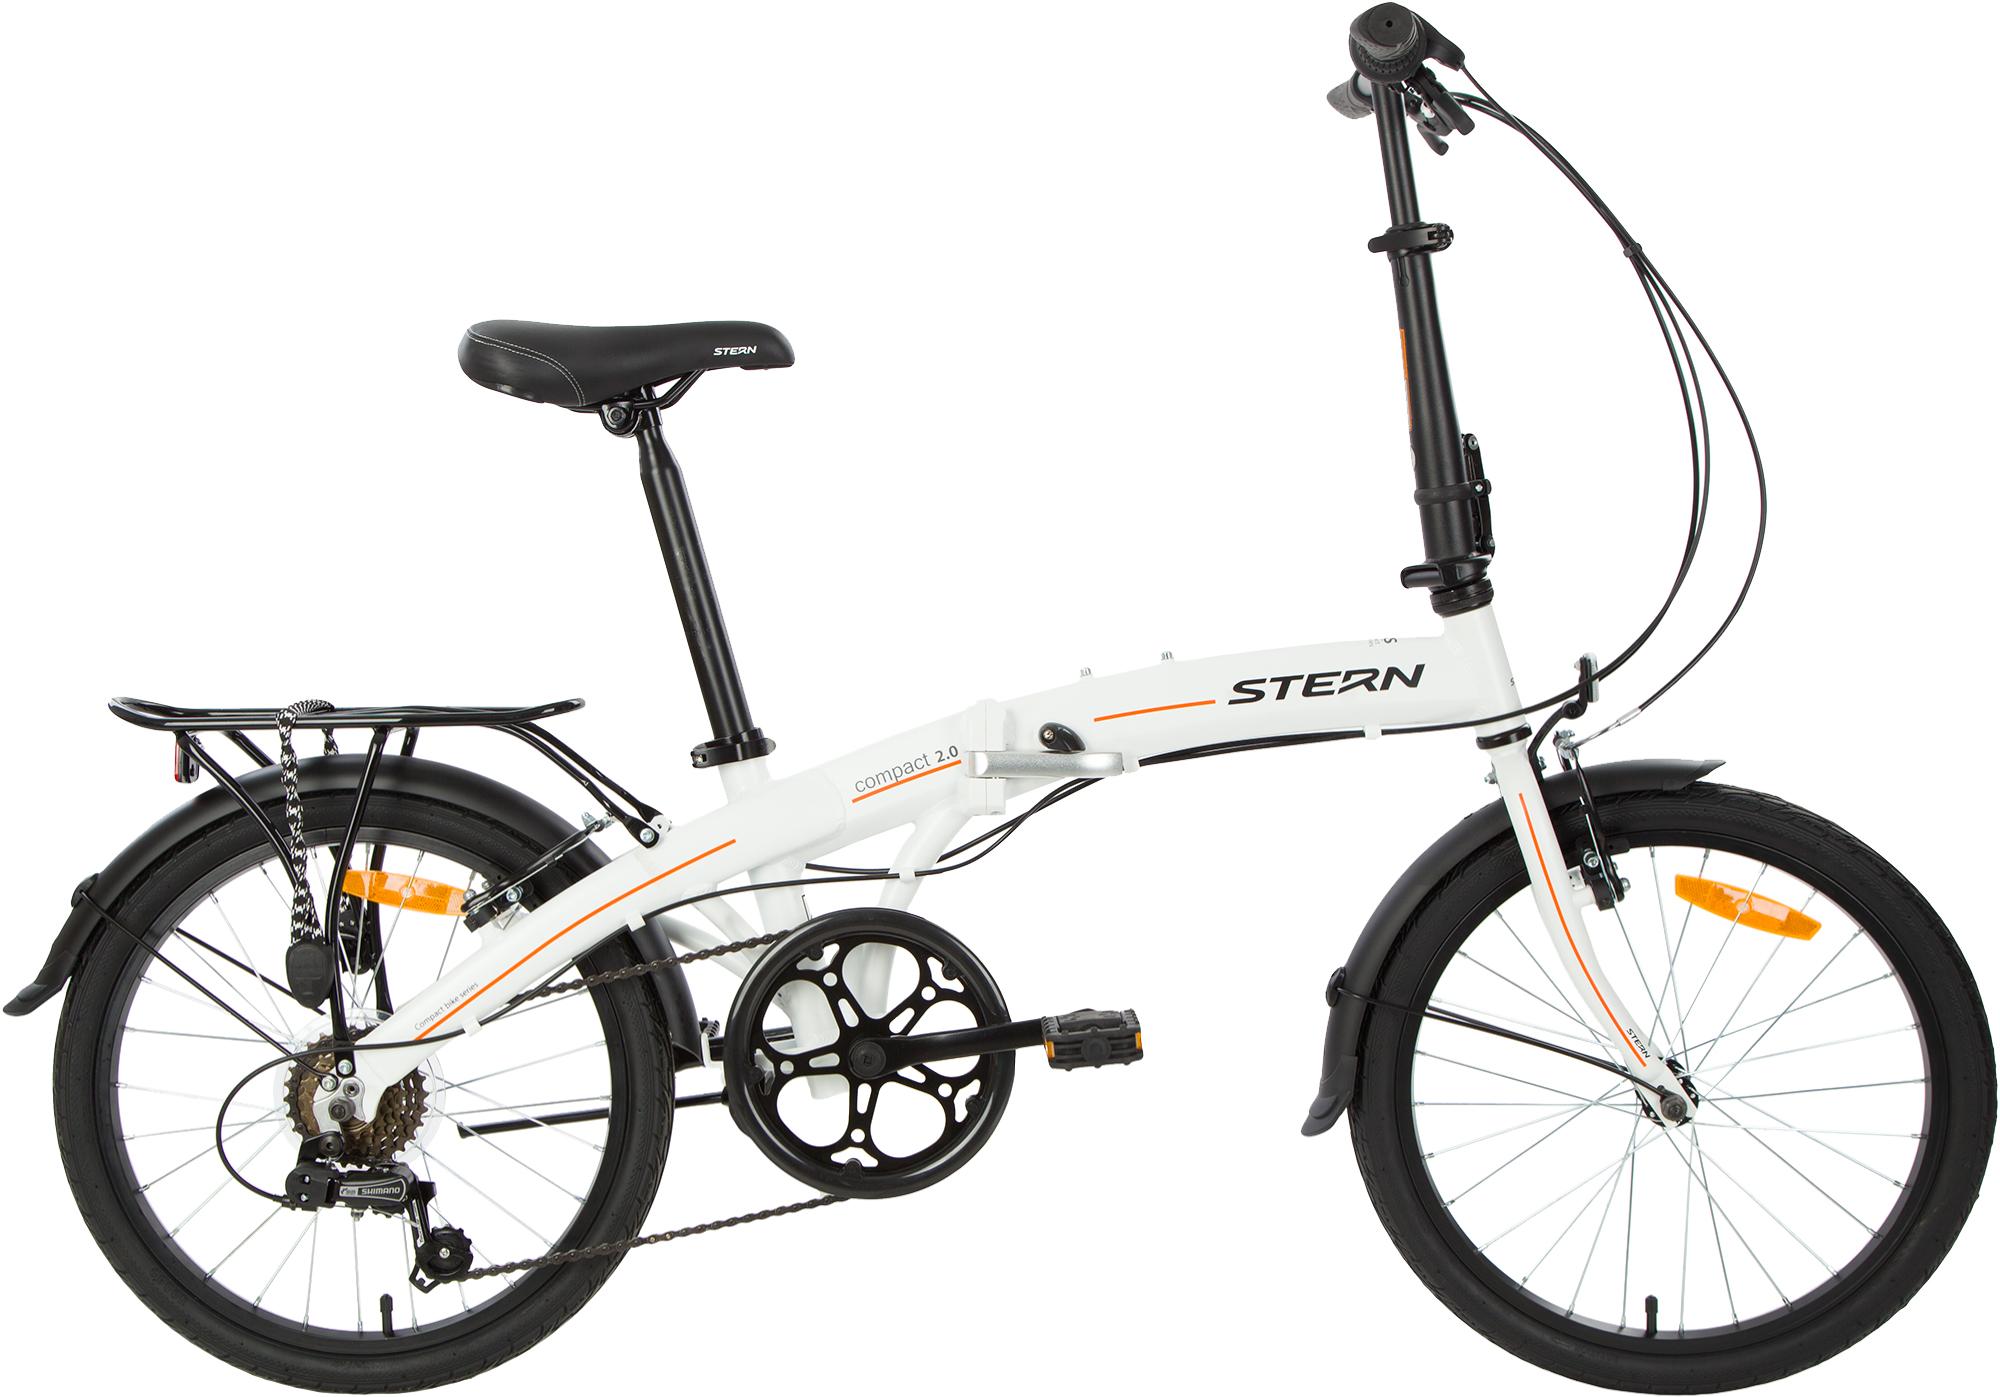 Stern Велосипед складной Stern Compact 2.0 alt 20 цена